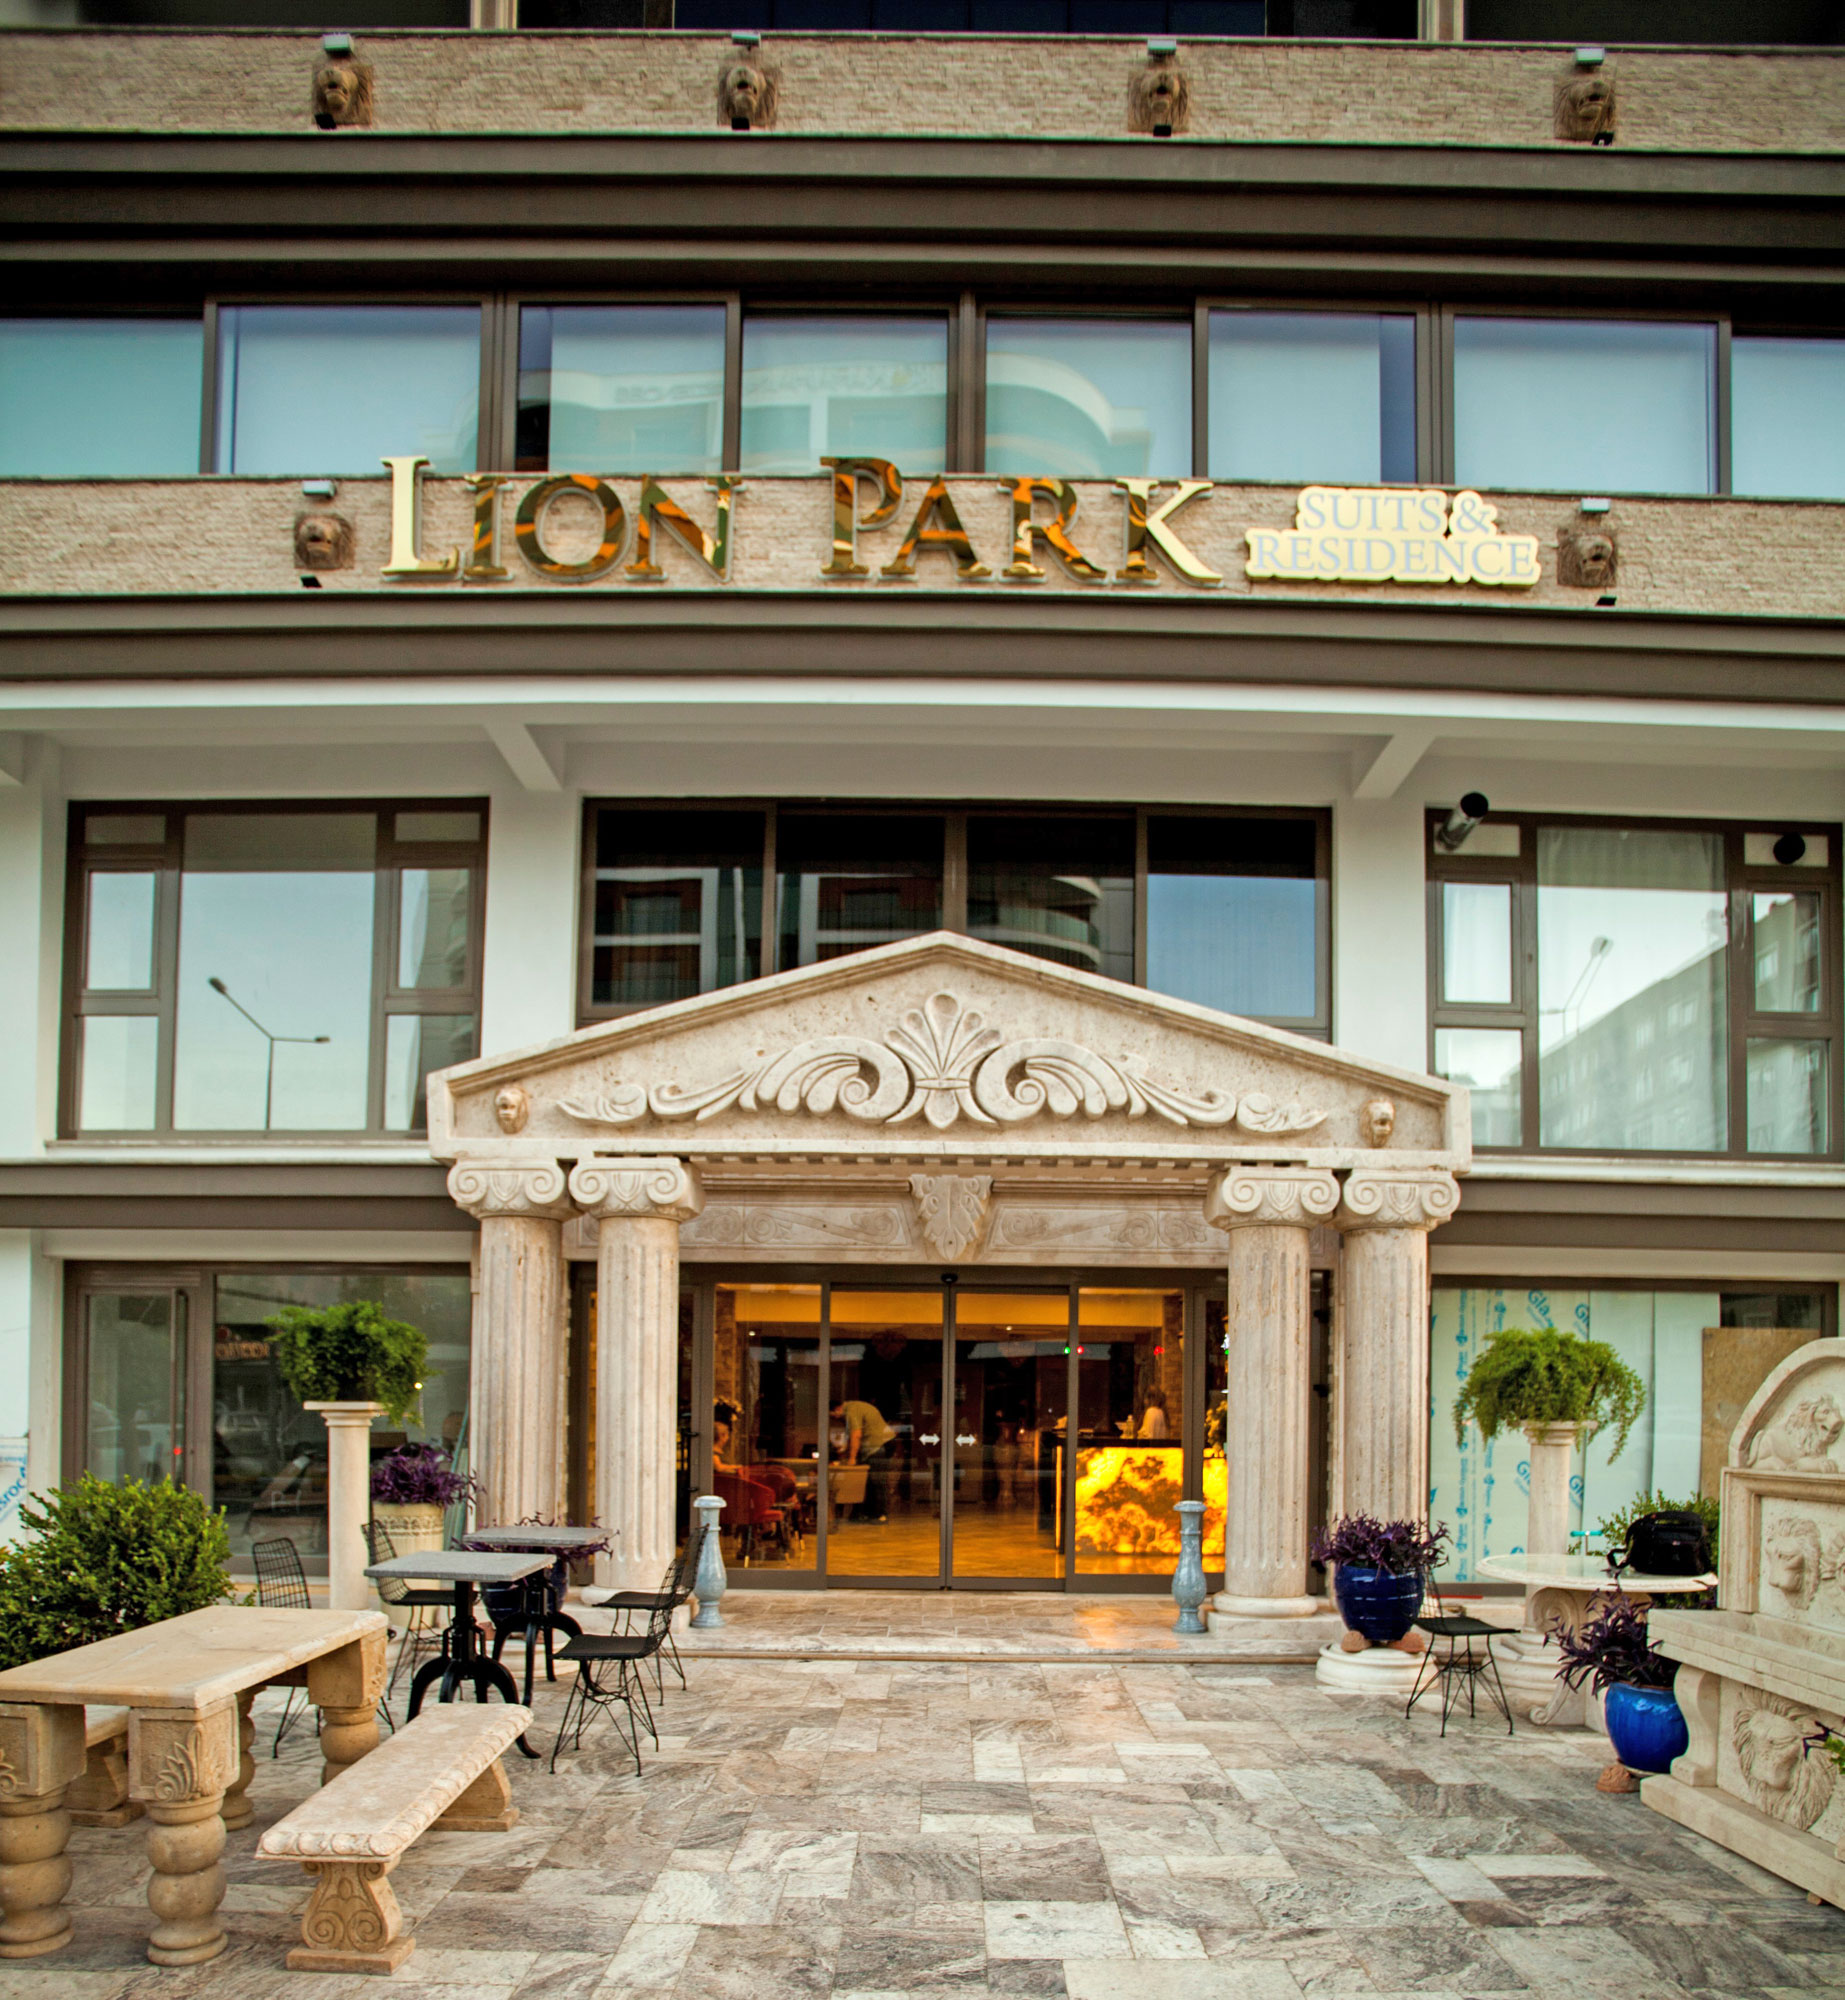 Lion Park Suites & Residence Hotel, Aydın